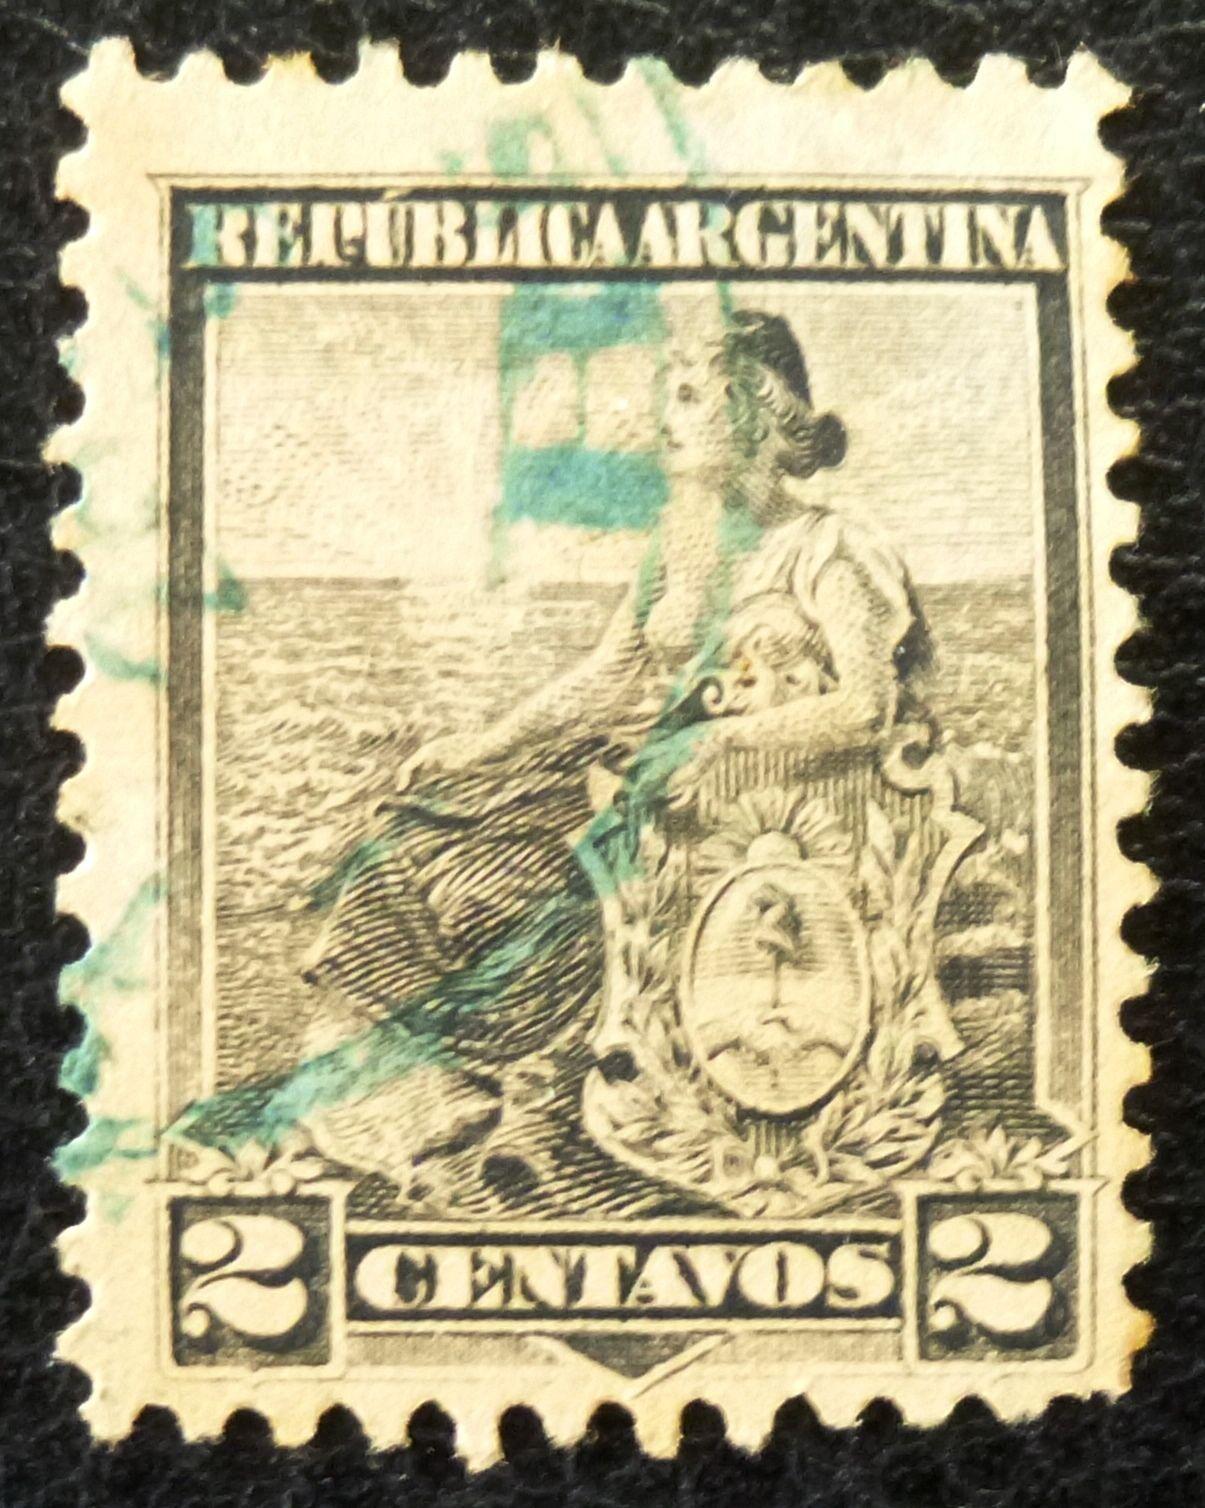 Hot Sale Old Argentine Republic Stamp Argentina